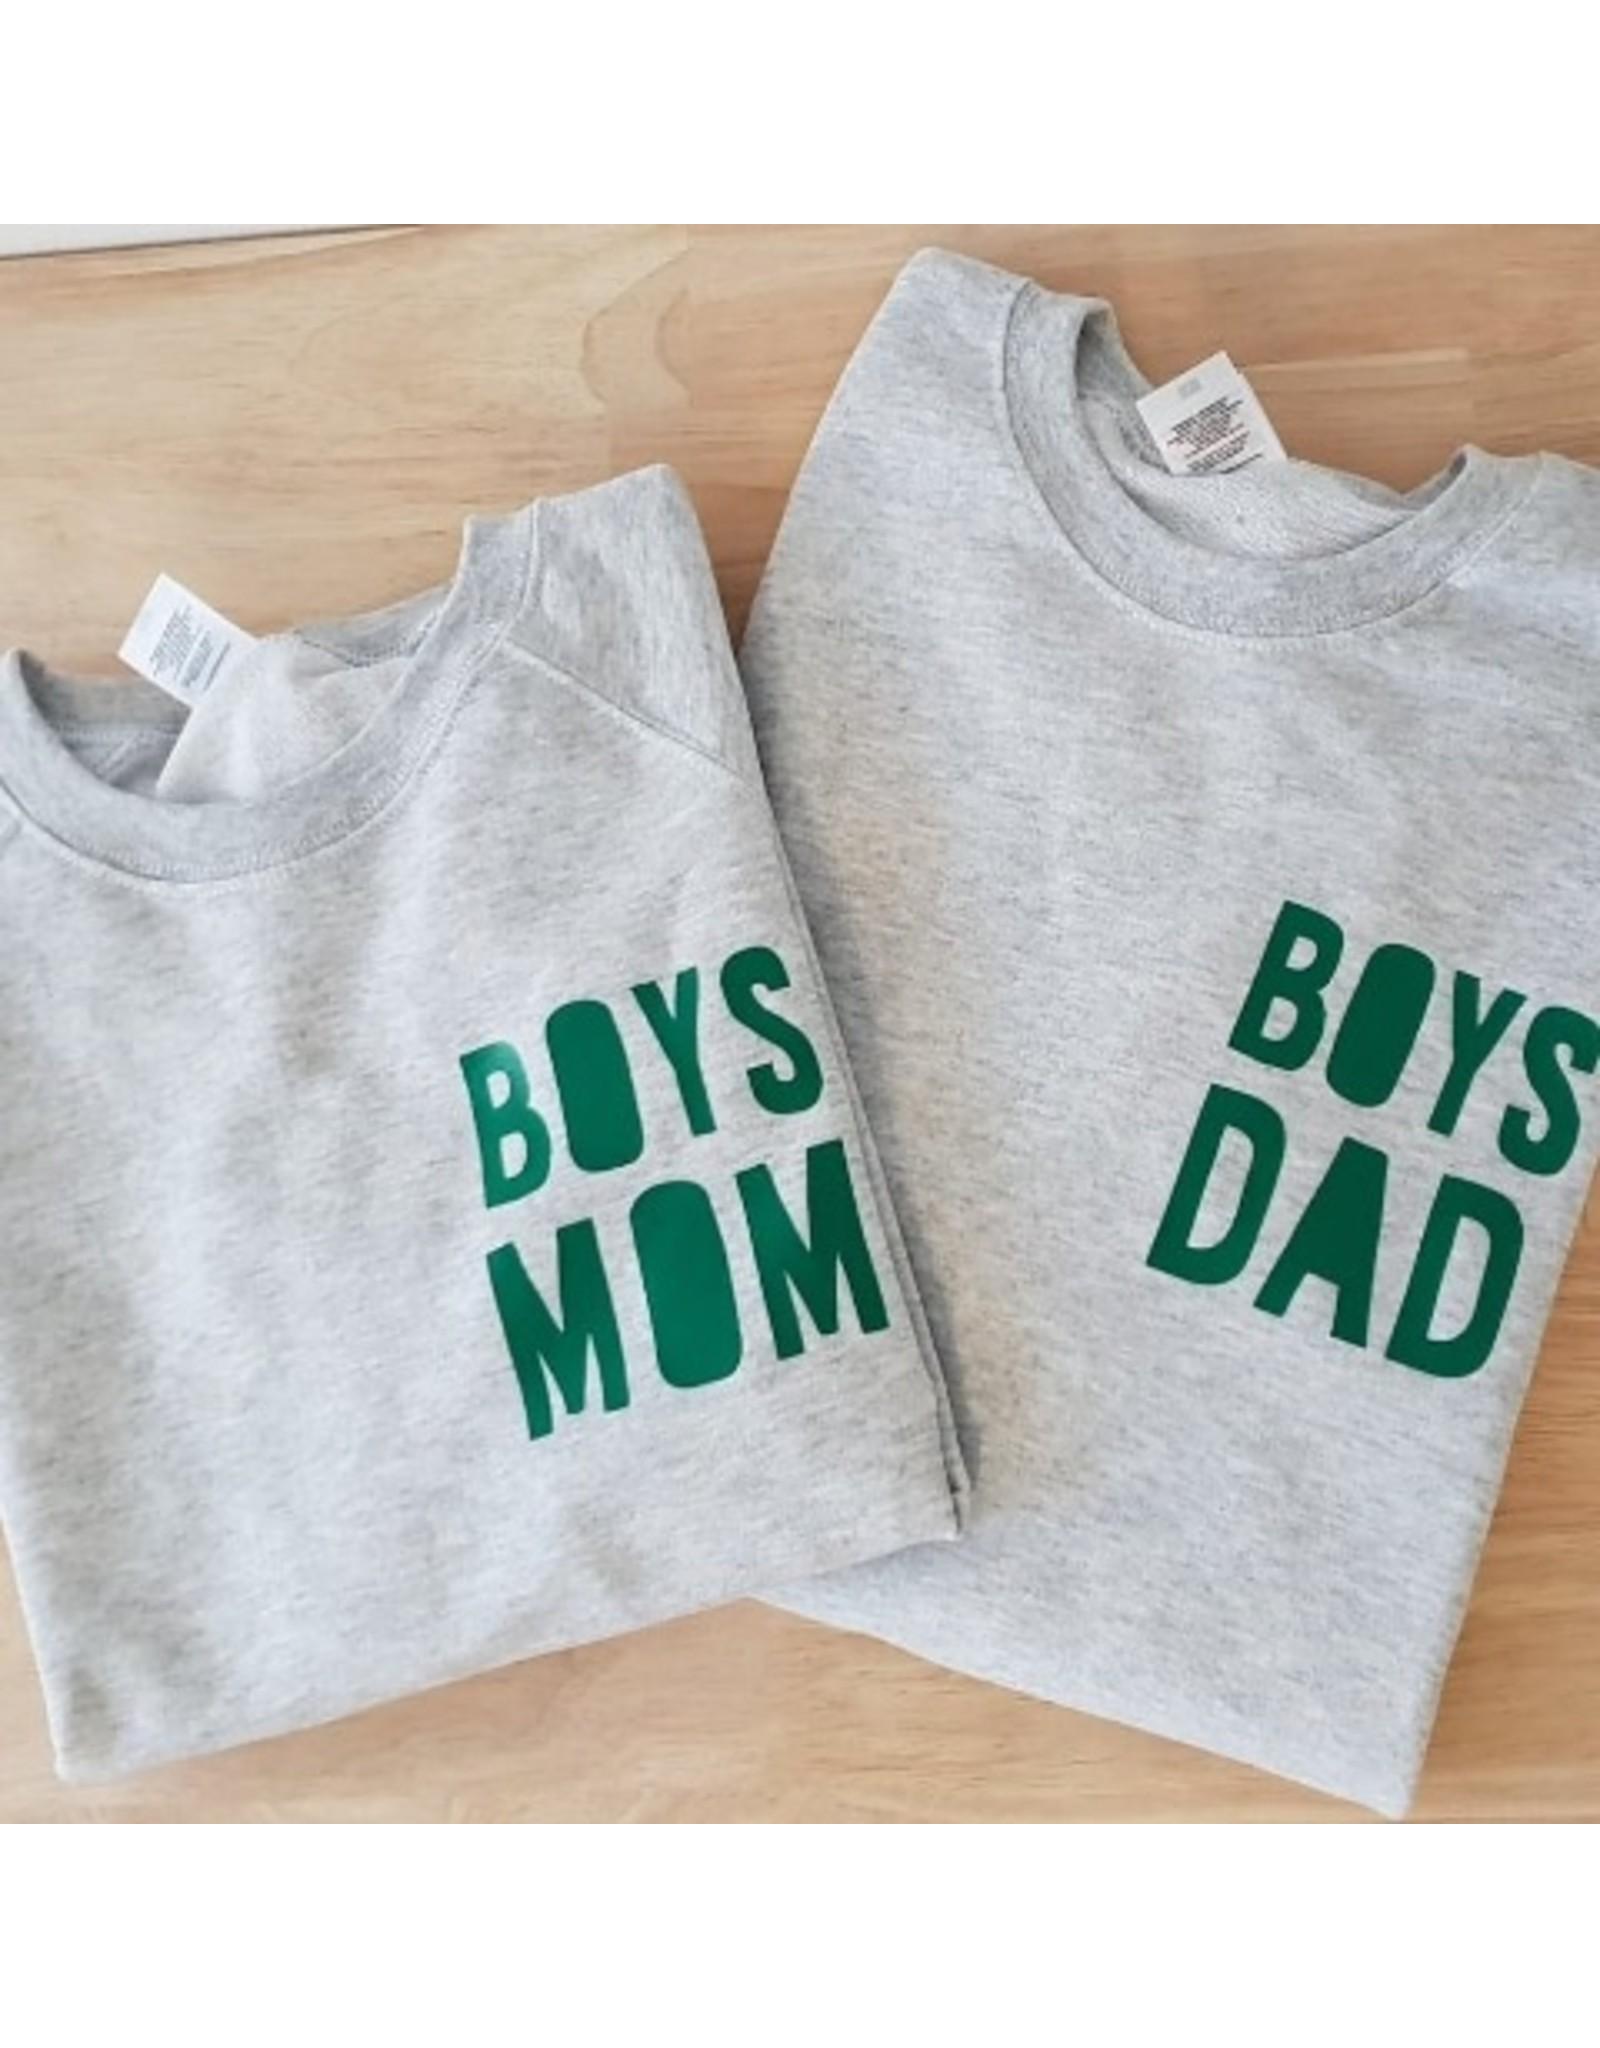 Sweater: Boys Mom